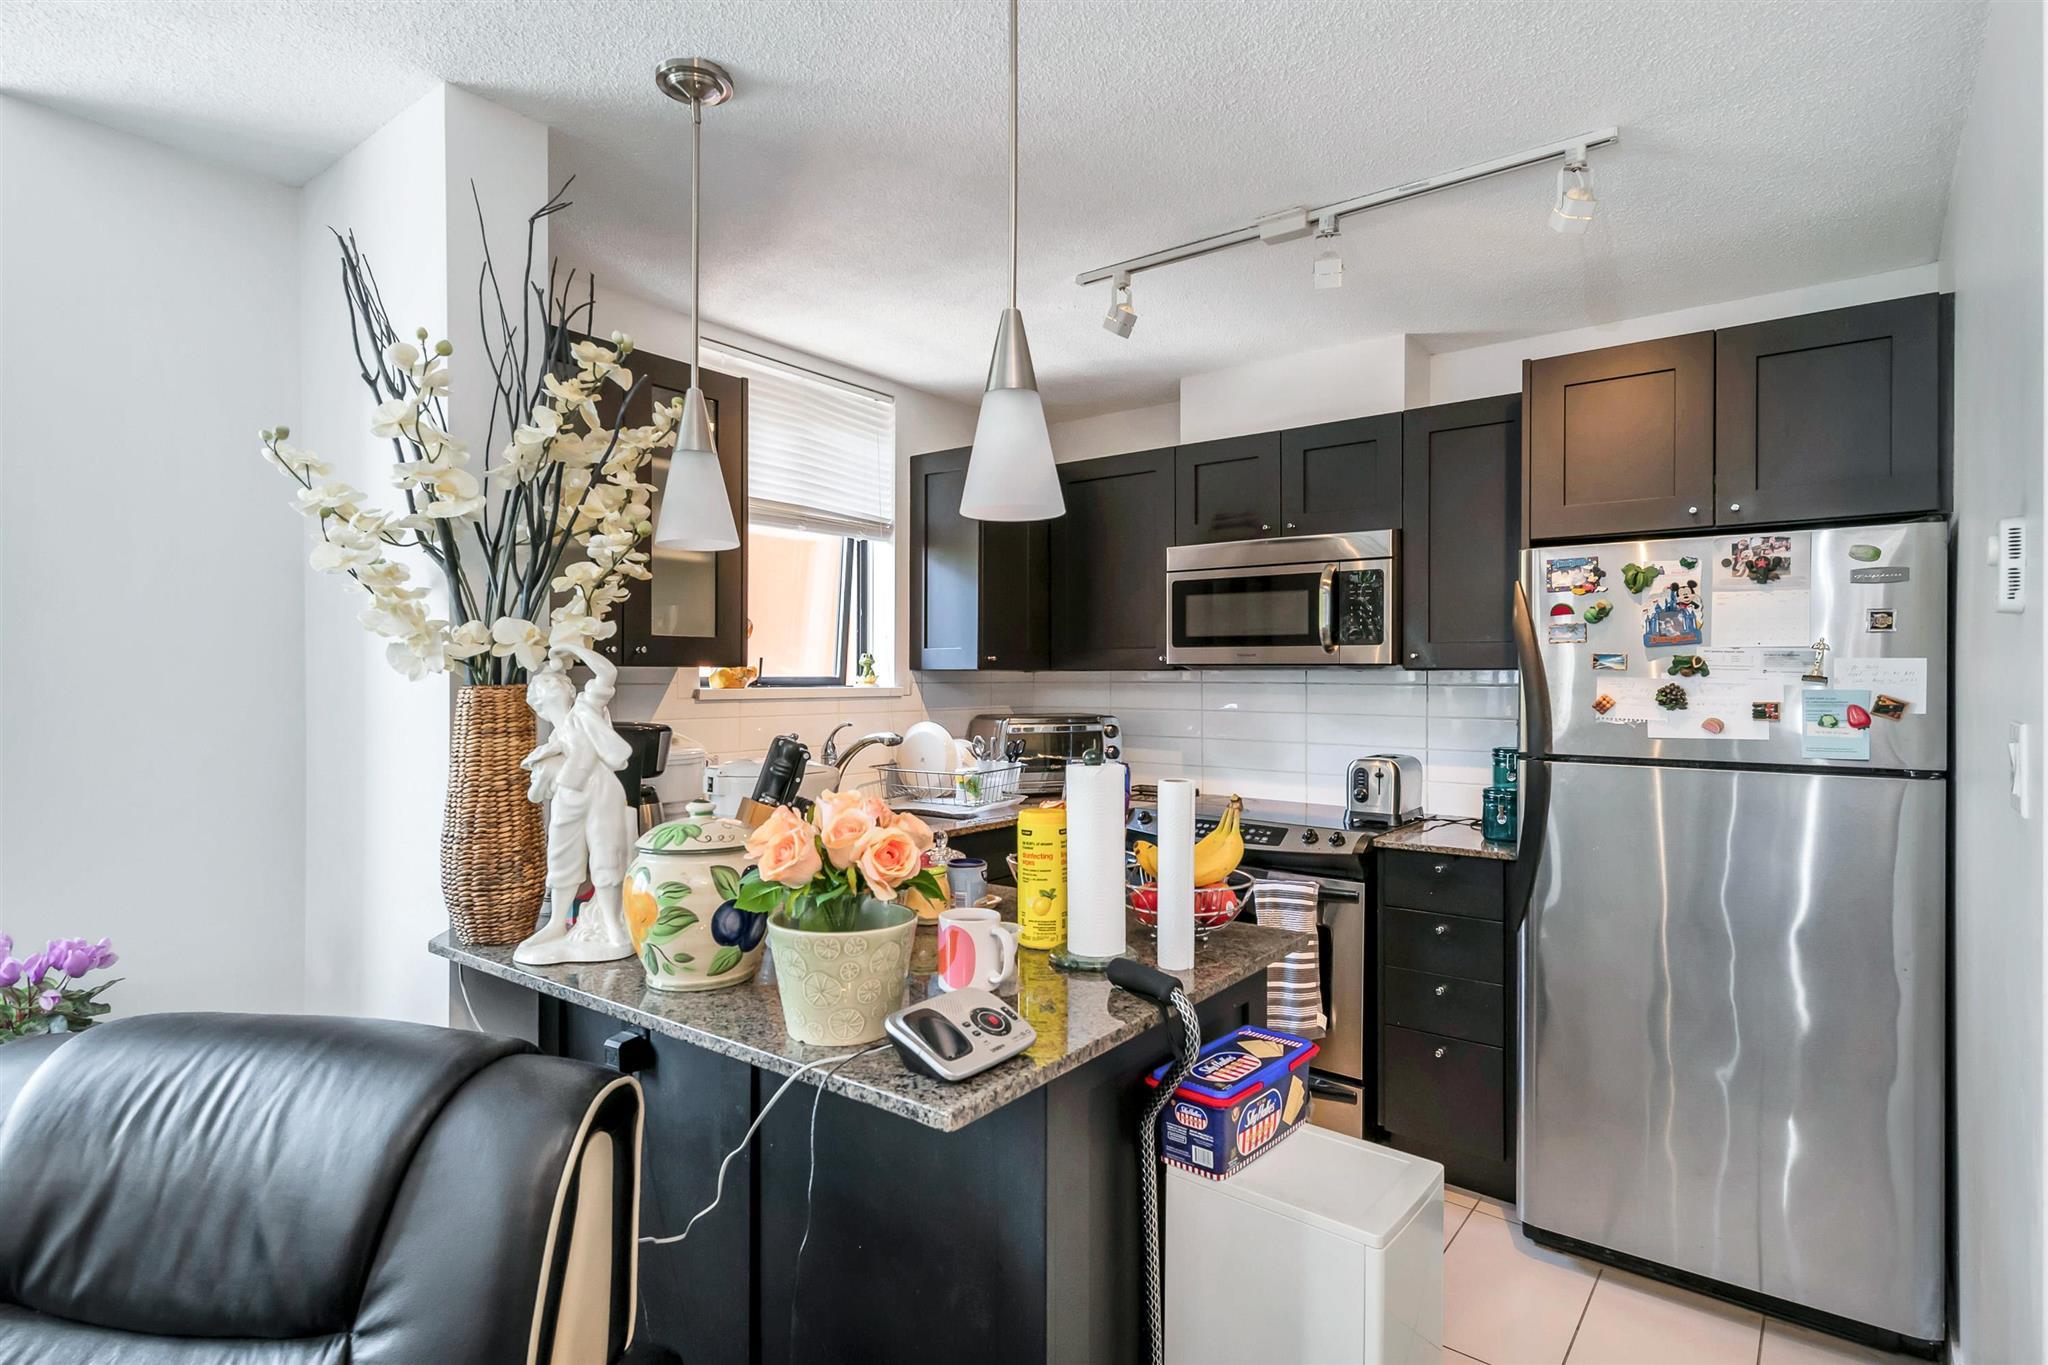 205 7225 ACORN AVENUE - Highgate Apartment/Condo for sale, 2 Bedrooms (R2606454) - #4